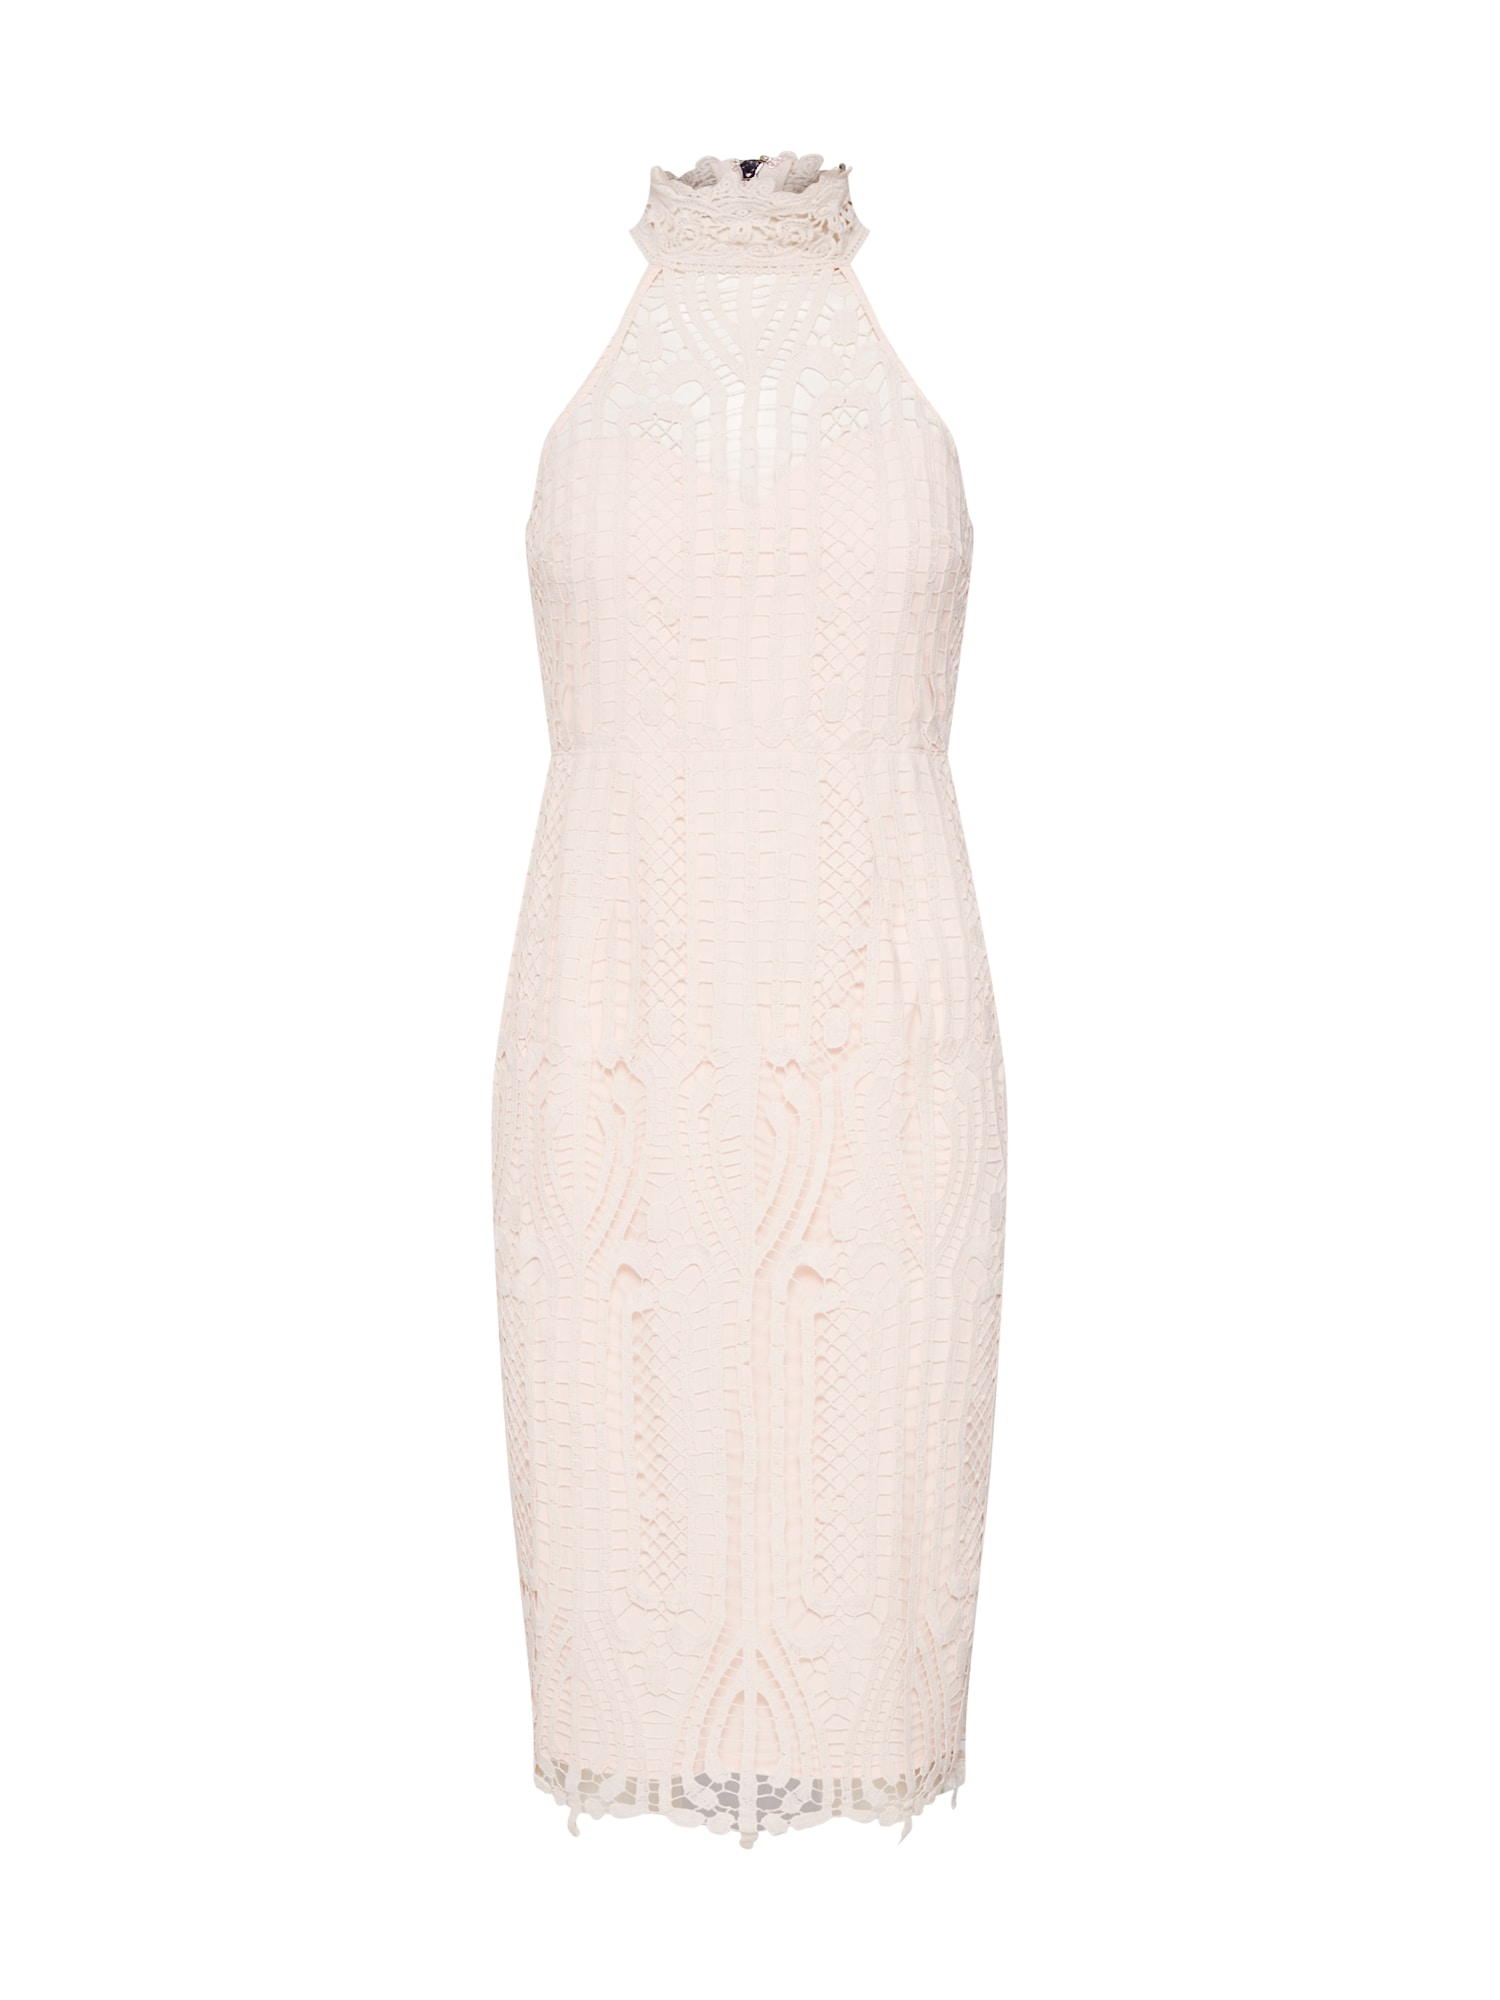 Pouzdrové šaty First Blush růže Love Triangle